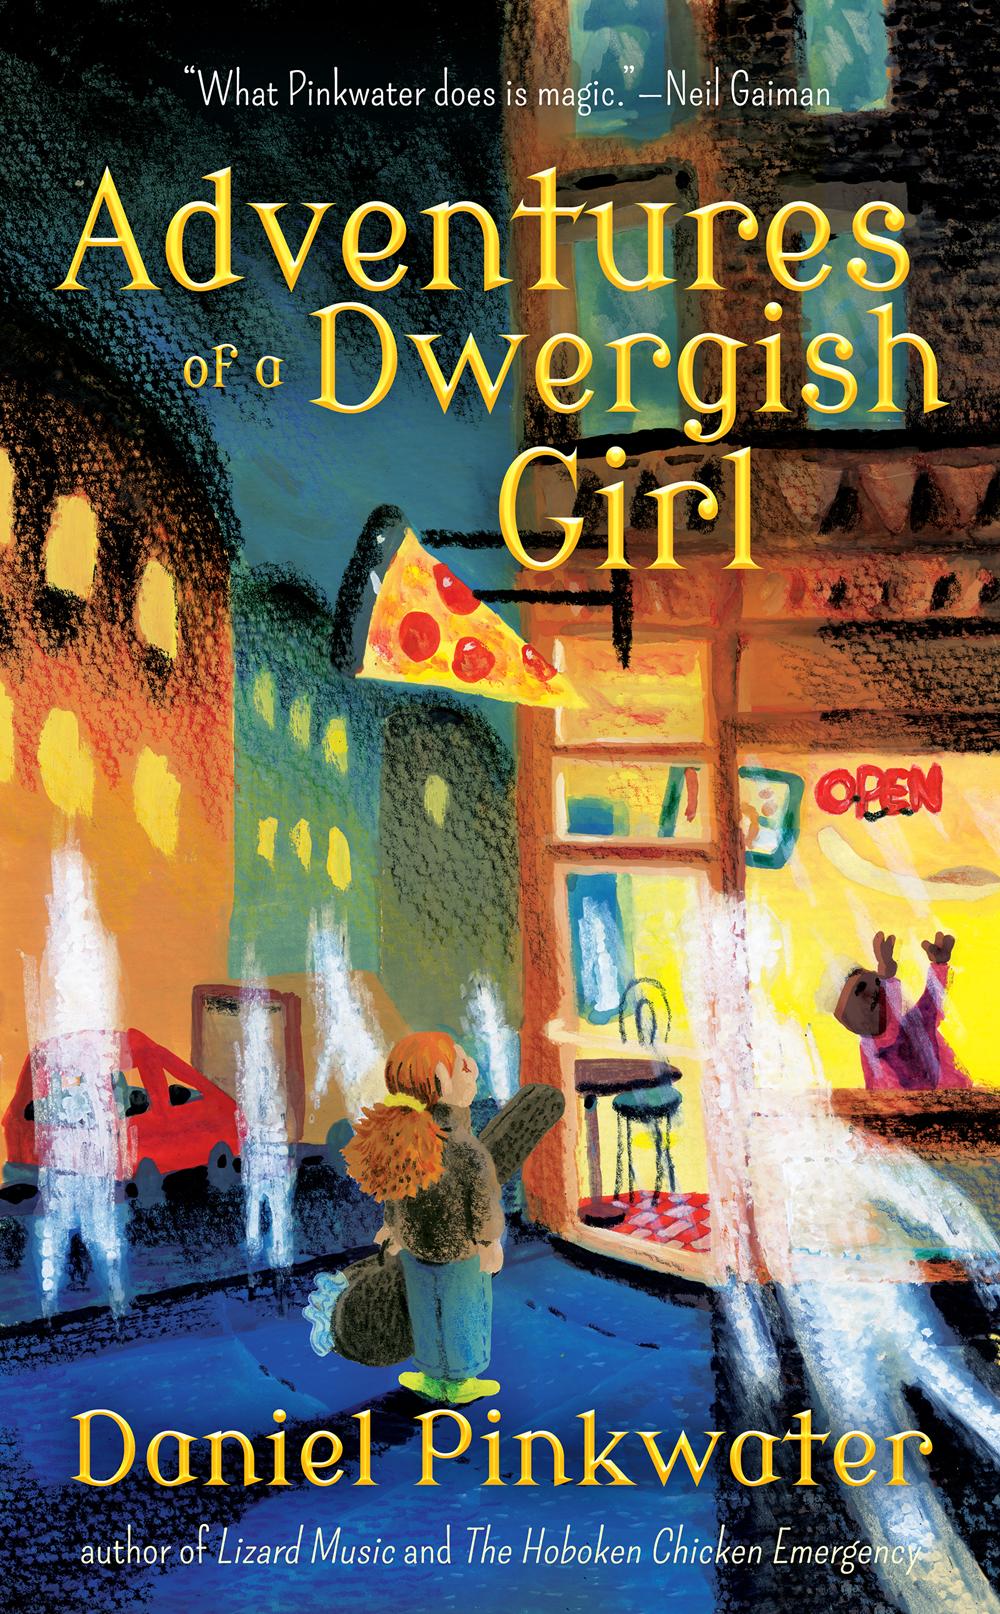 Adventures of a Dwergish Girl by Daniel Pinkwater